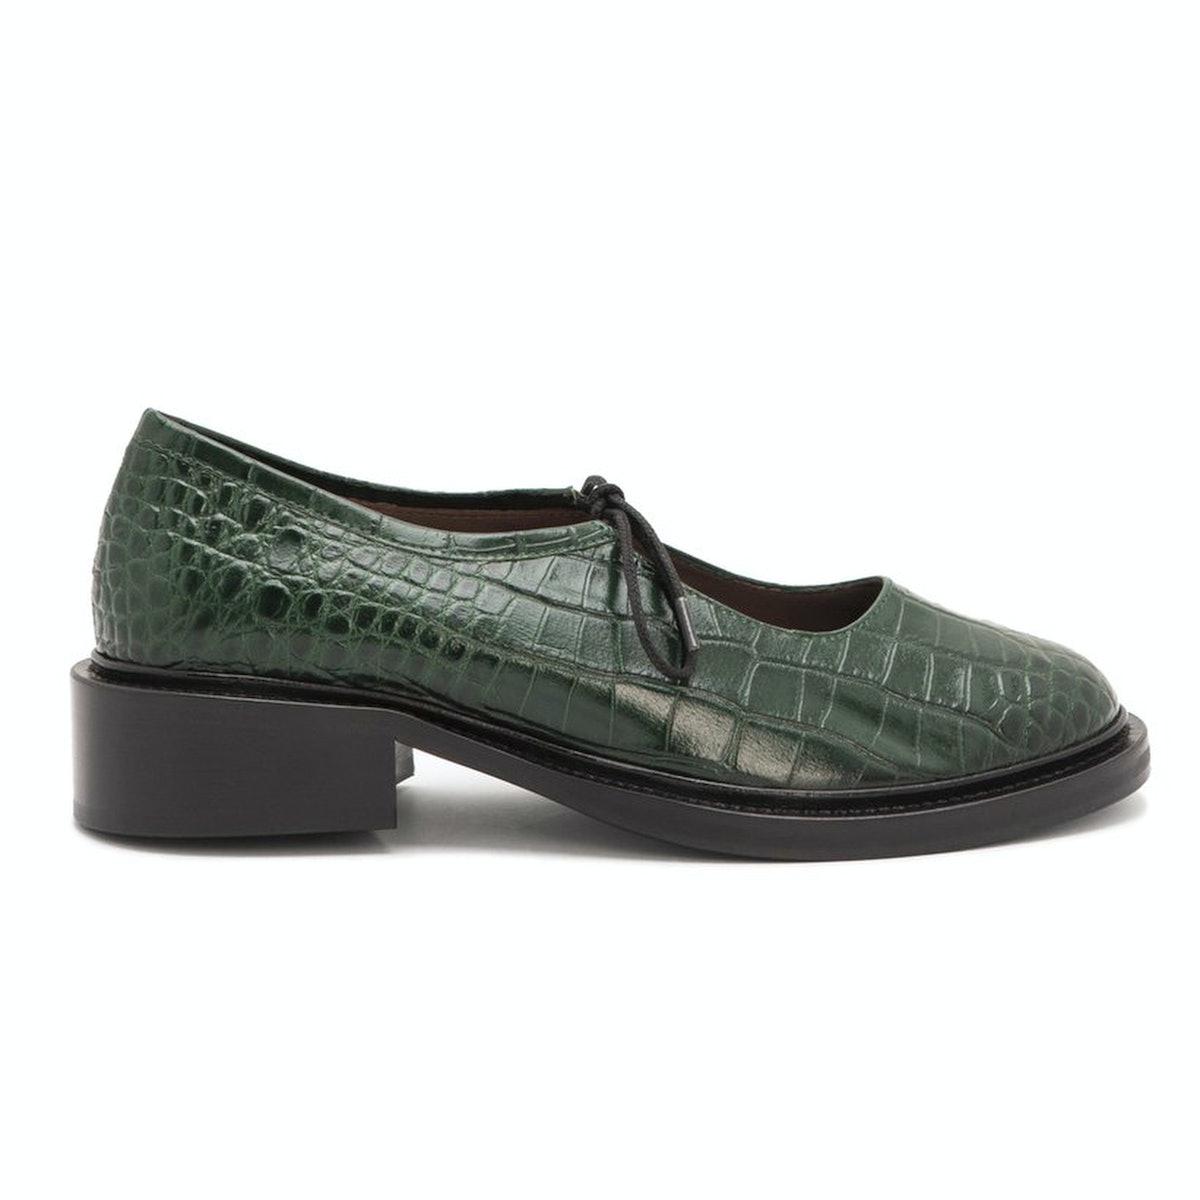 Nicole Saldaña Fabiana Jungle Green Embossed Croc Shoe